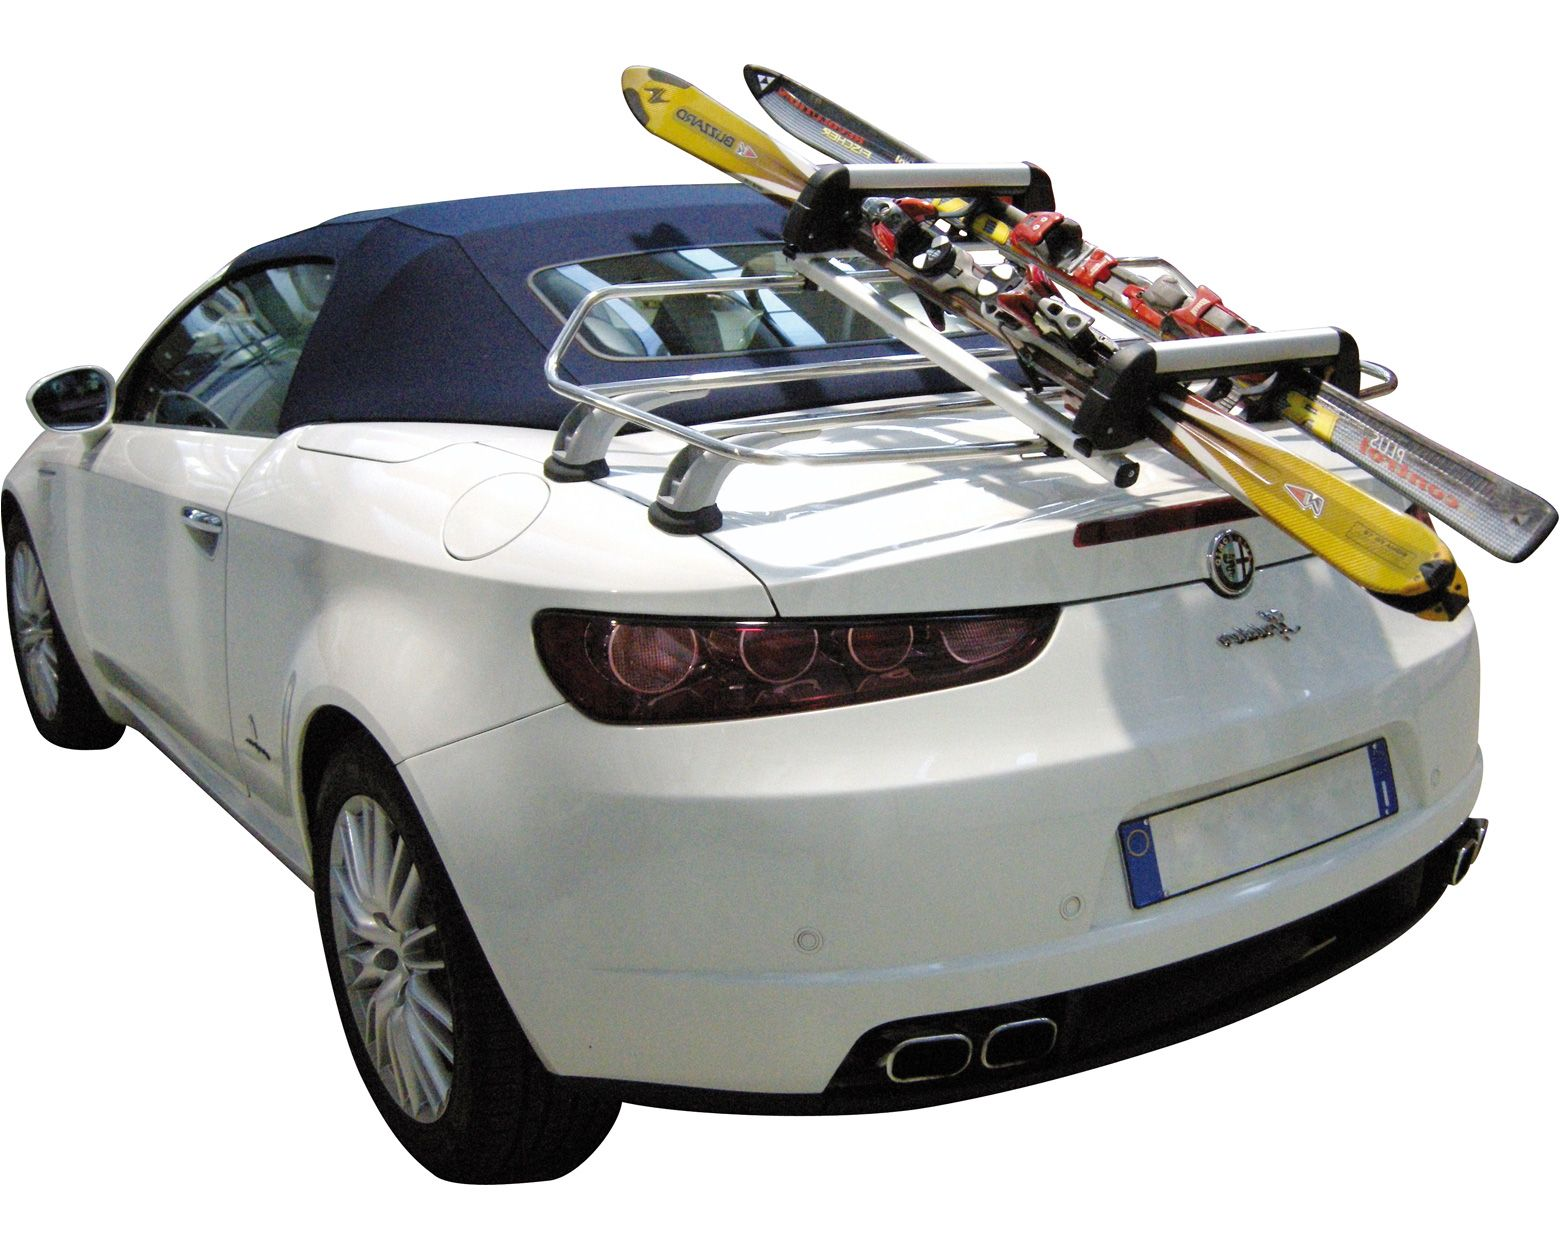 Unispider Ski & Board Transforms Rear Luggage Racks into